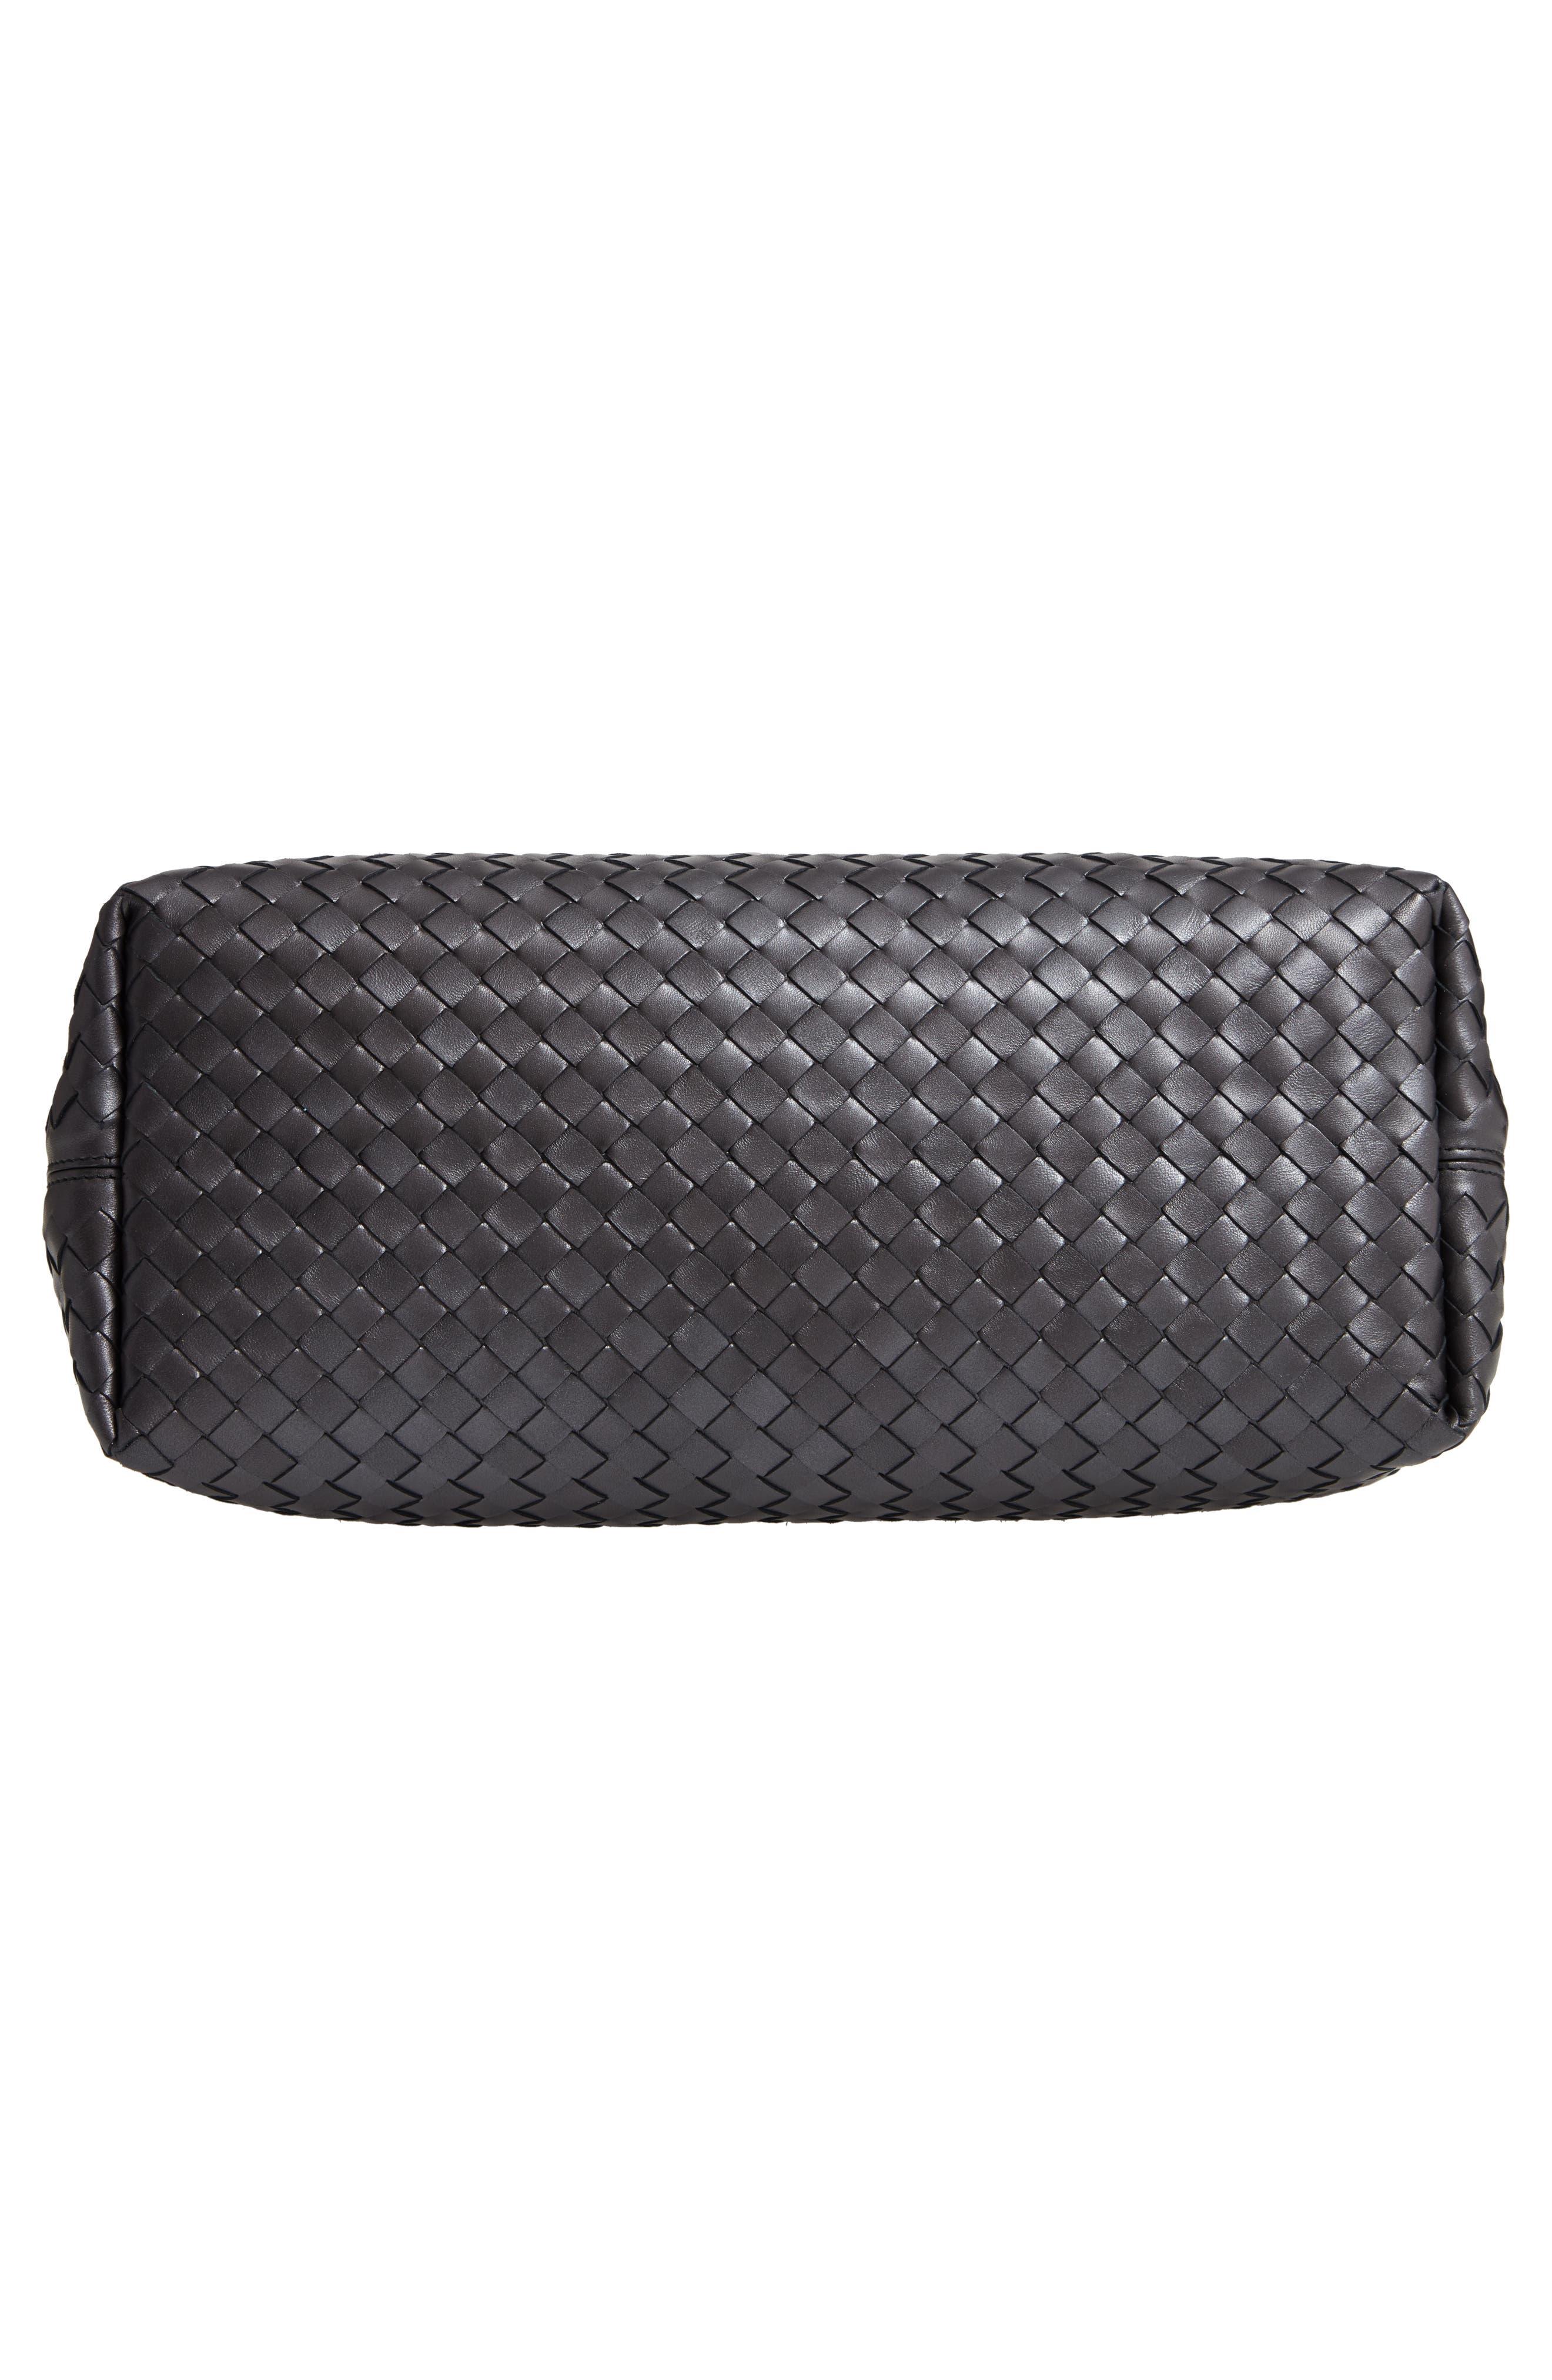 Intrecciato Leather Tote Bag,                             Alternate thumbnail 6, color,                             040